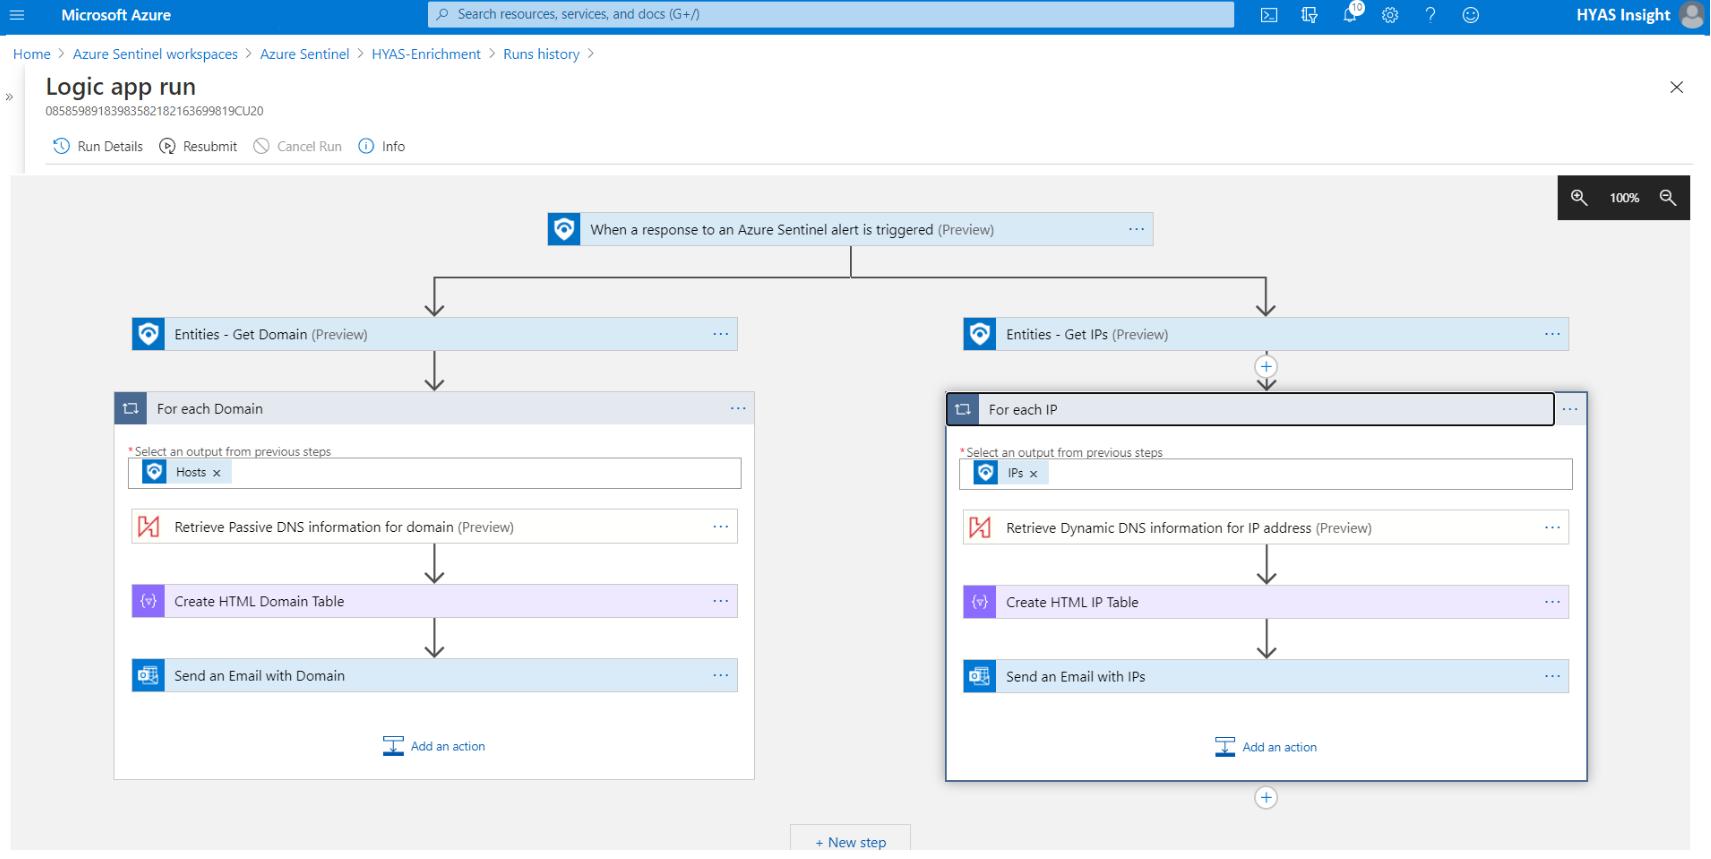 Microsoft-Azure-Sentinel-LogicApp.image 1